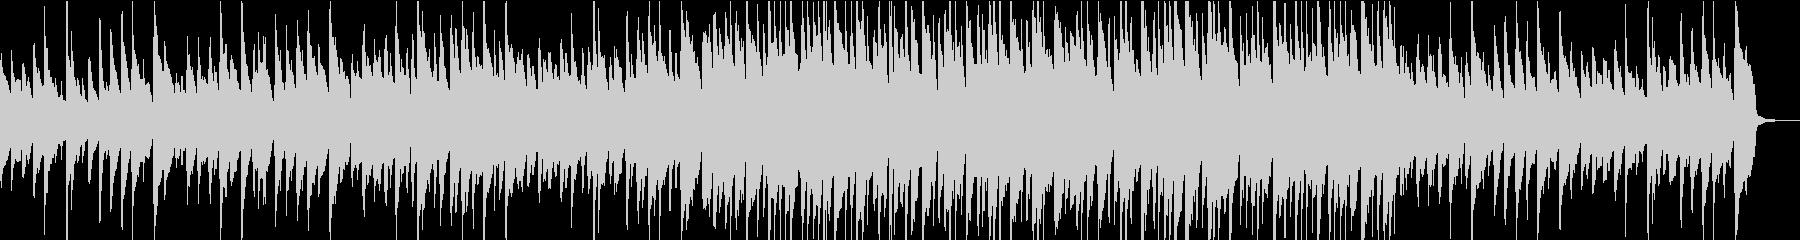 Happy Musicの未再生の波形